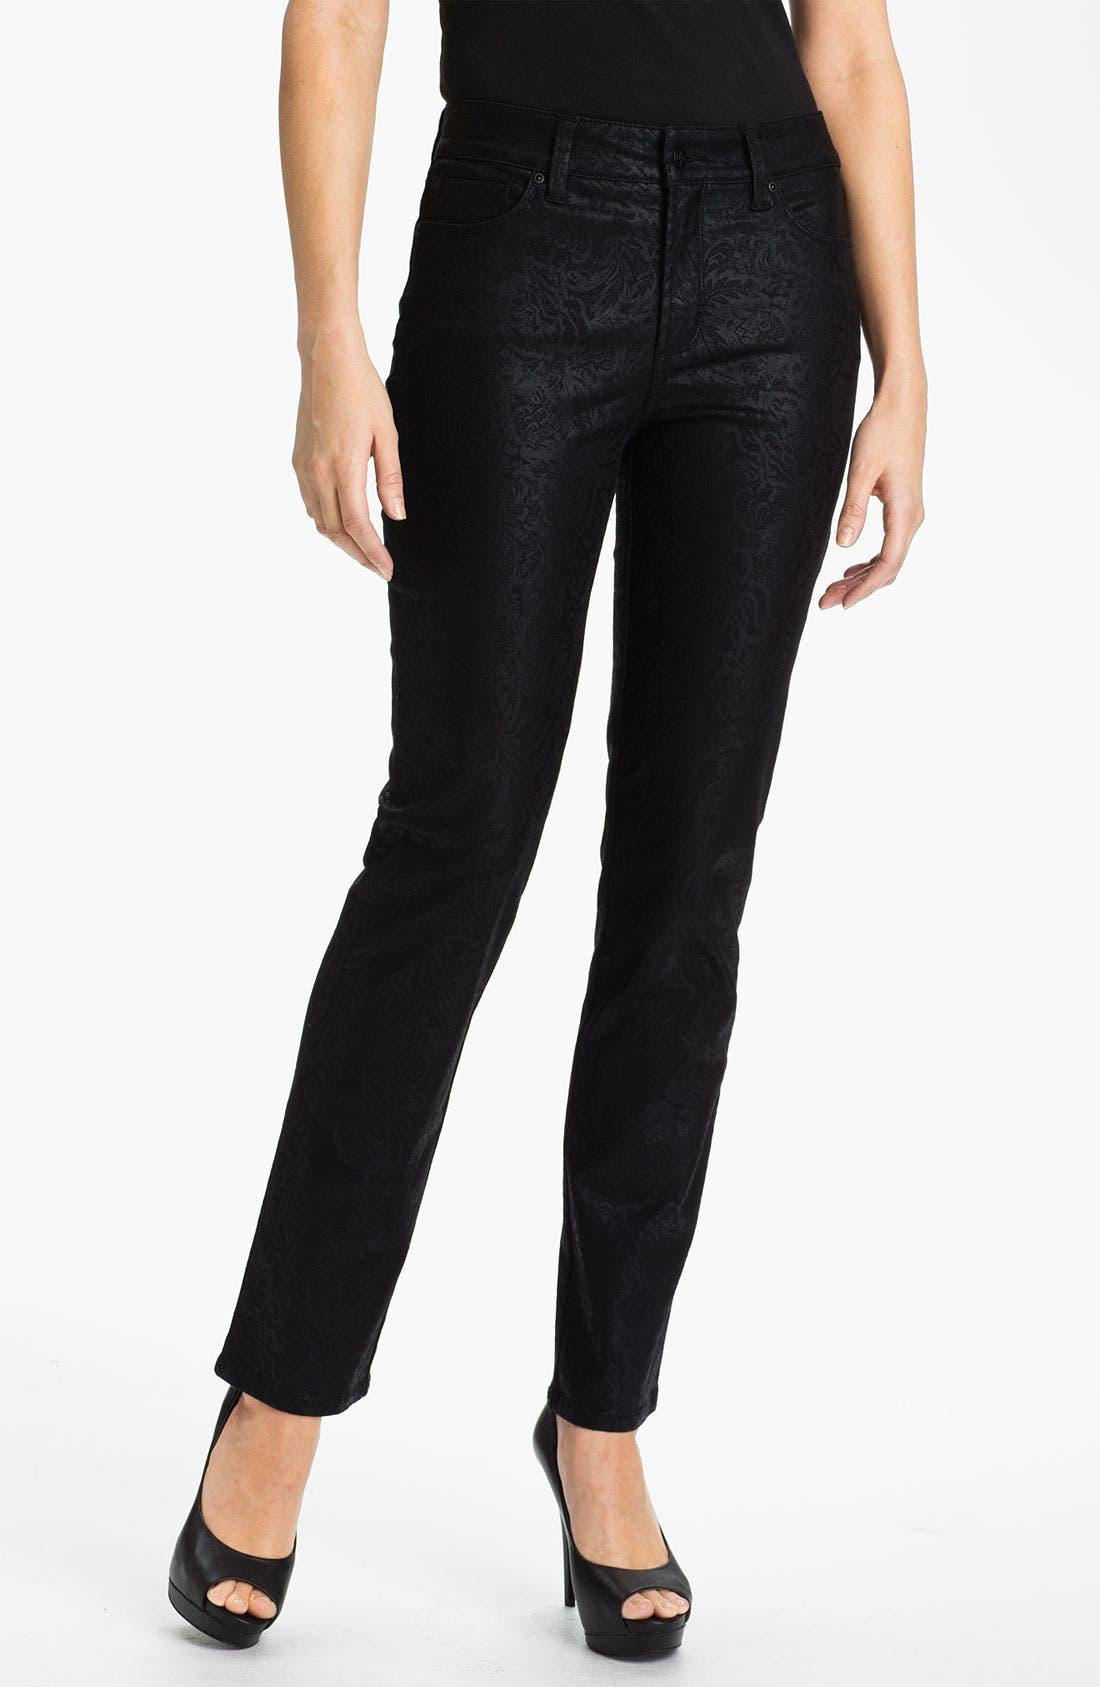 Main Image - NYDJ 'Sheri - Metallic Gilded Lily' Twill Skinny Jeans